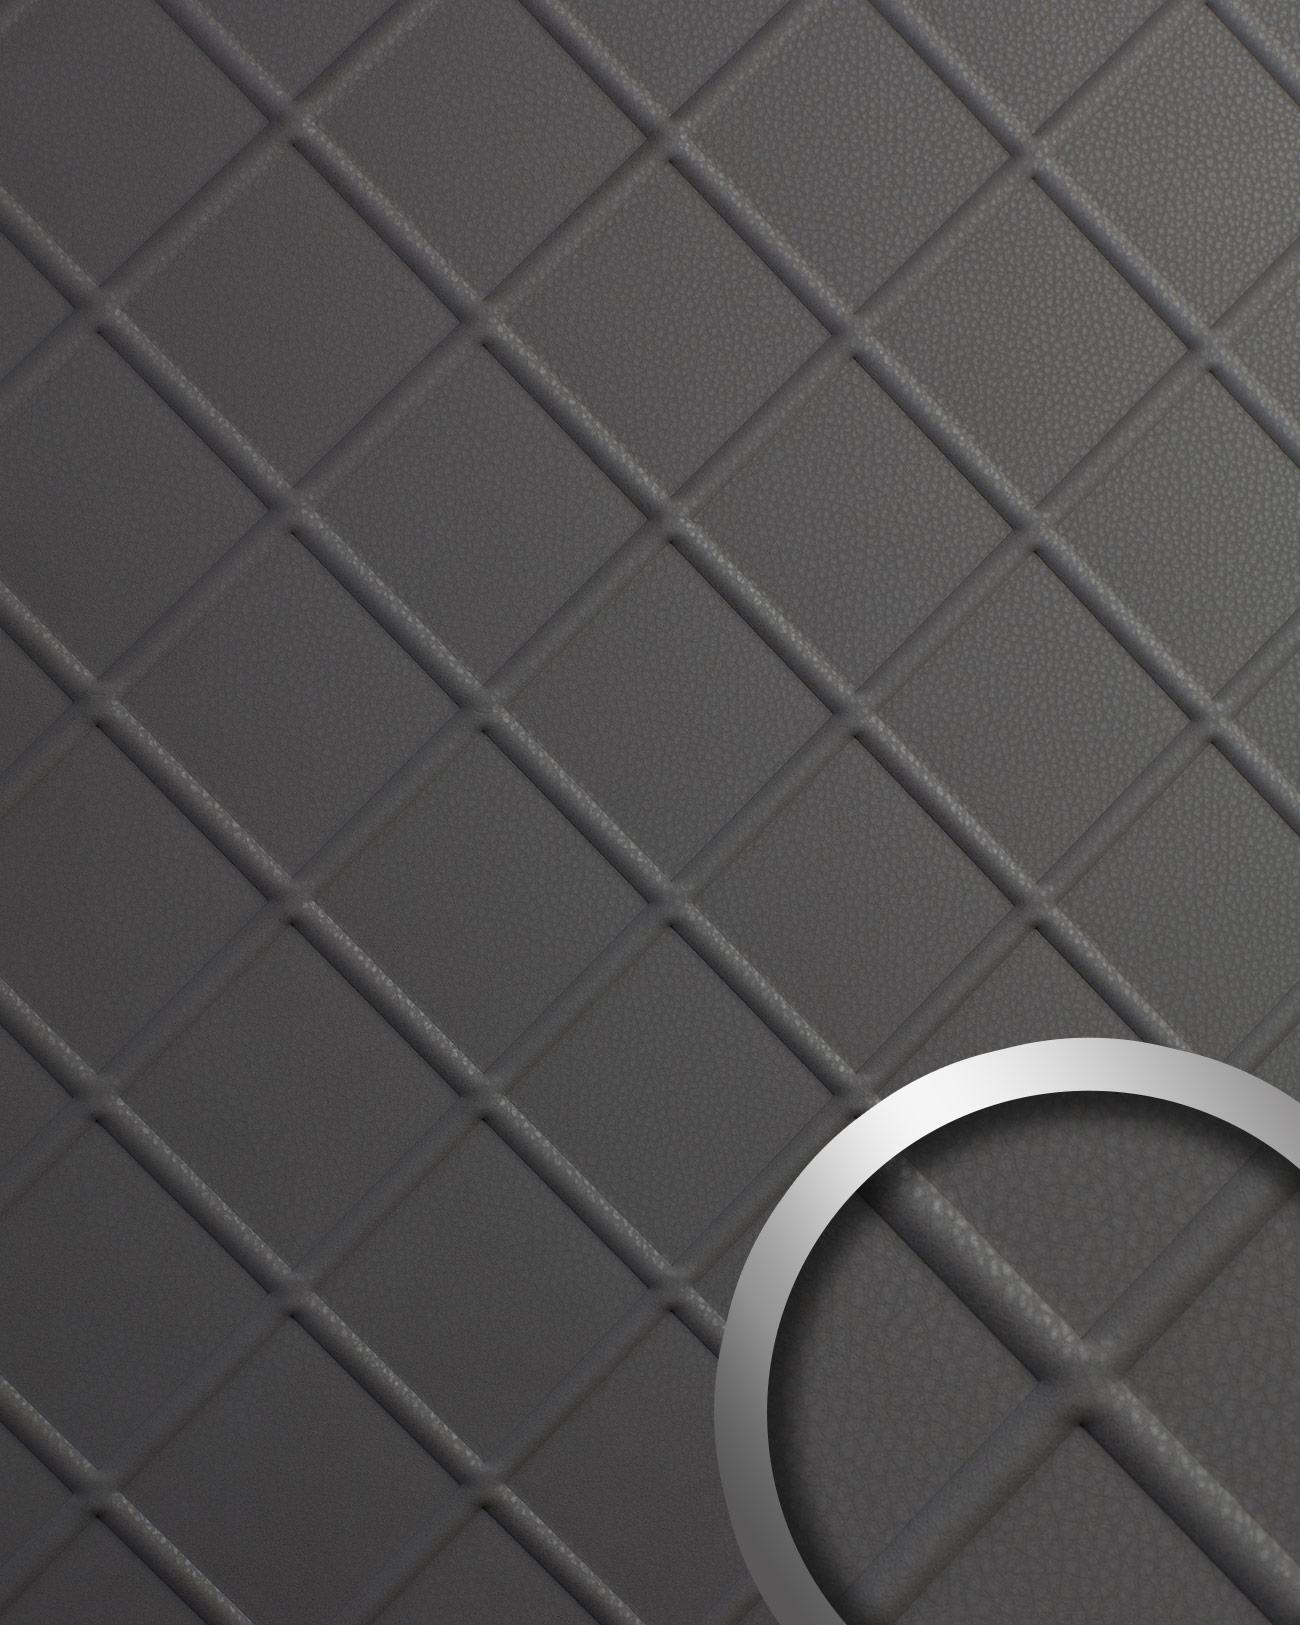 panneau d coratif aspect cuir wallface 19546 cord charcoal. Black Bedroom Furniture Sets. Home Design Ideas